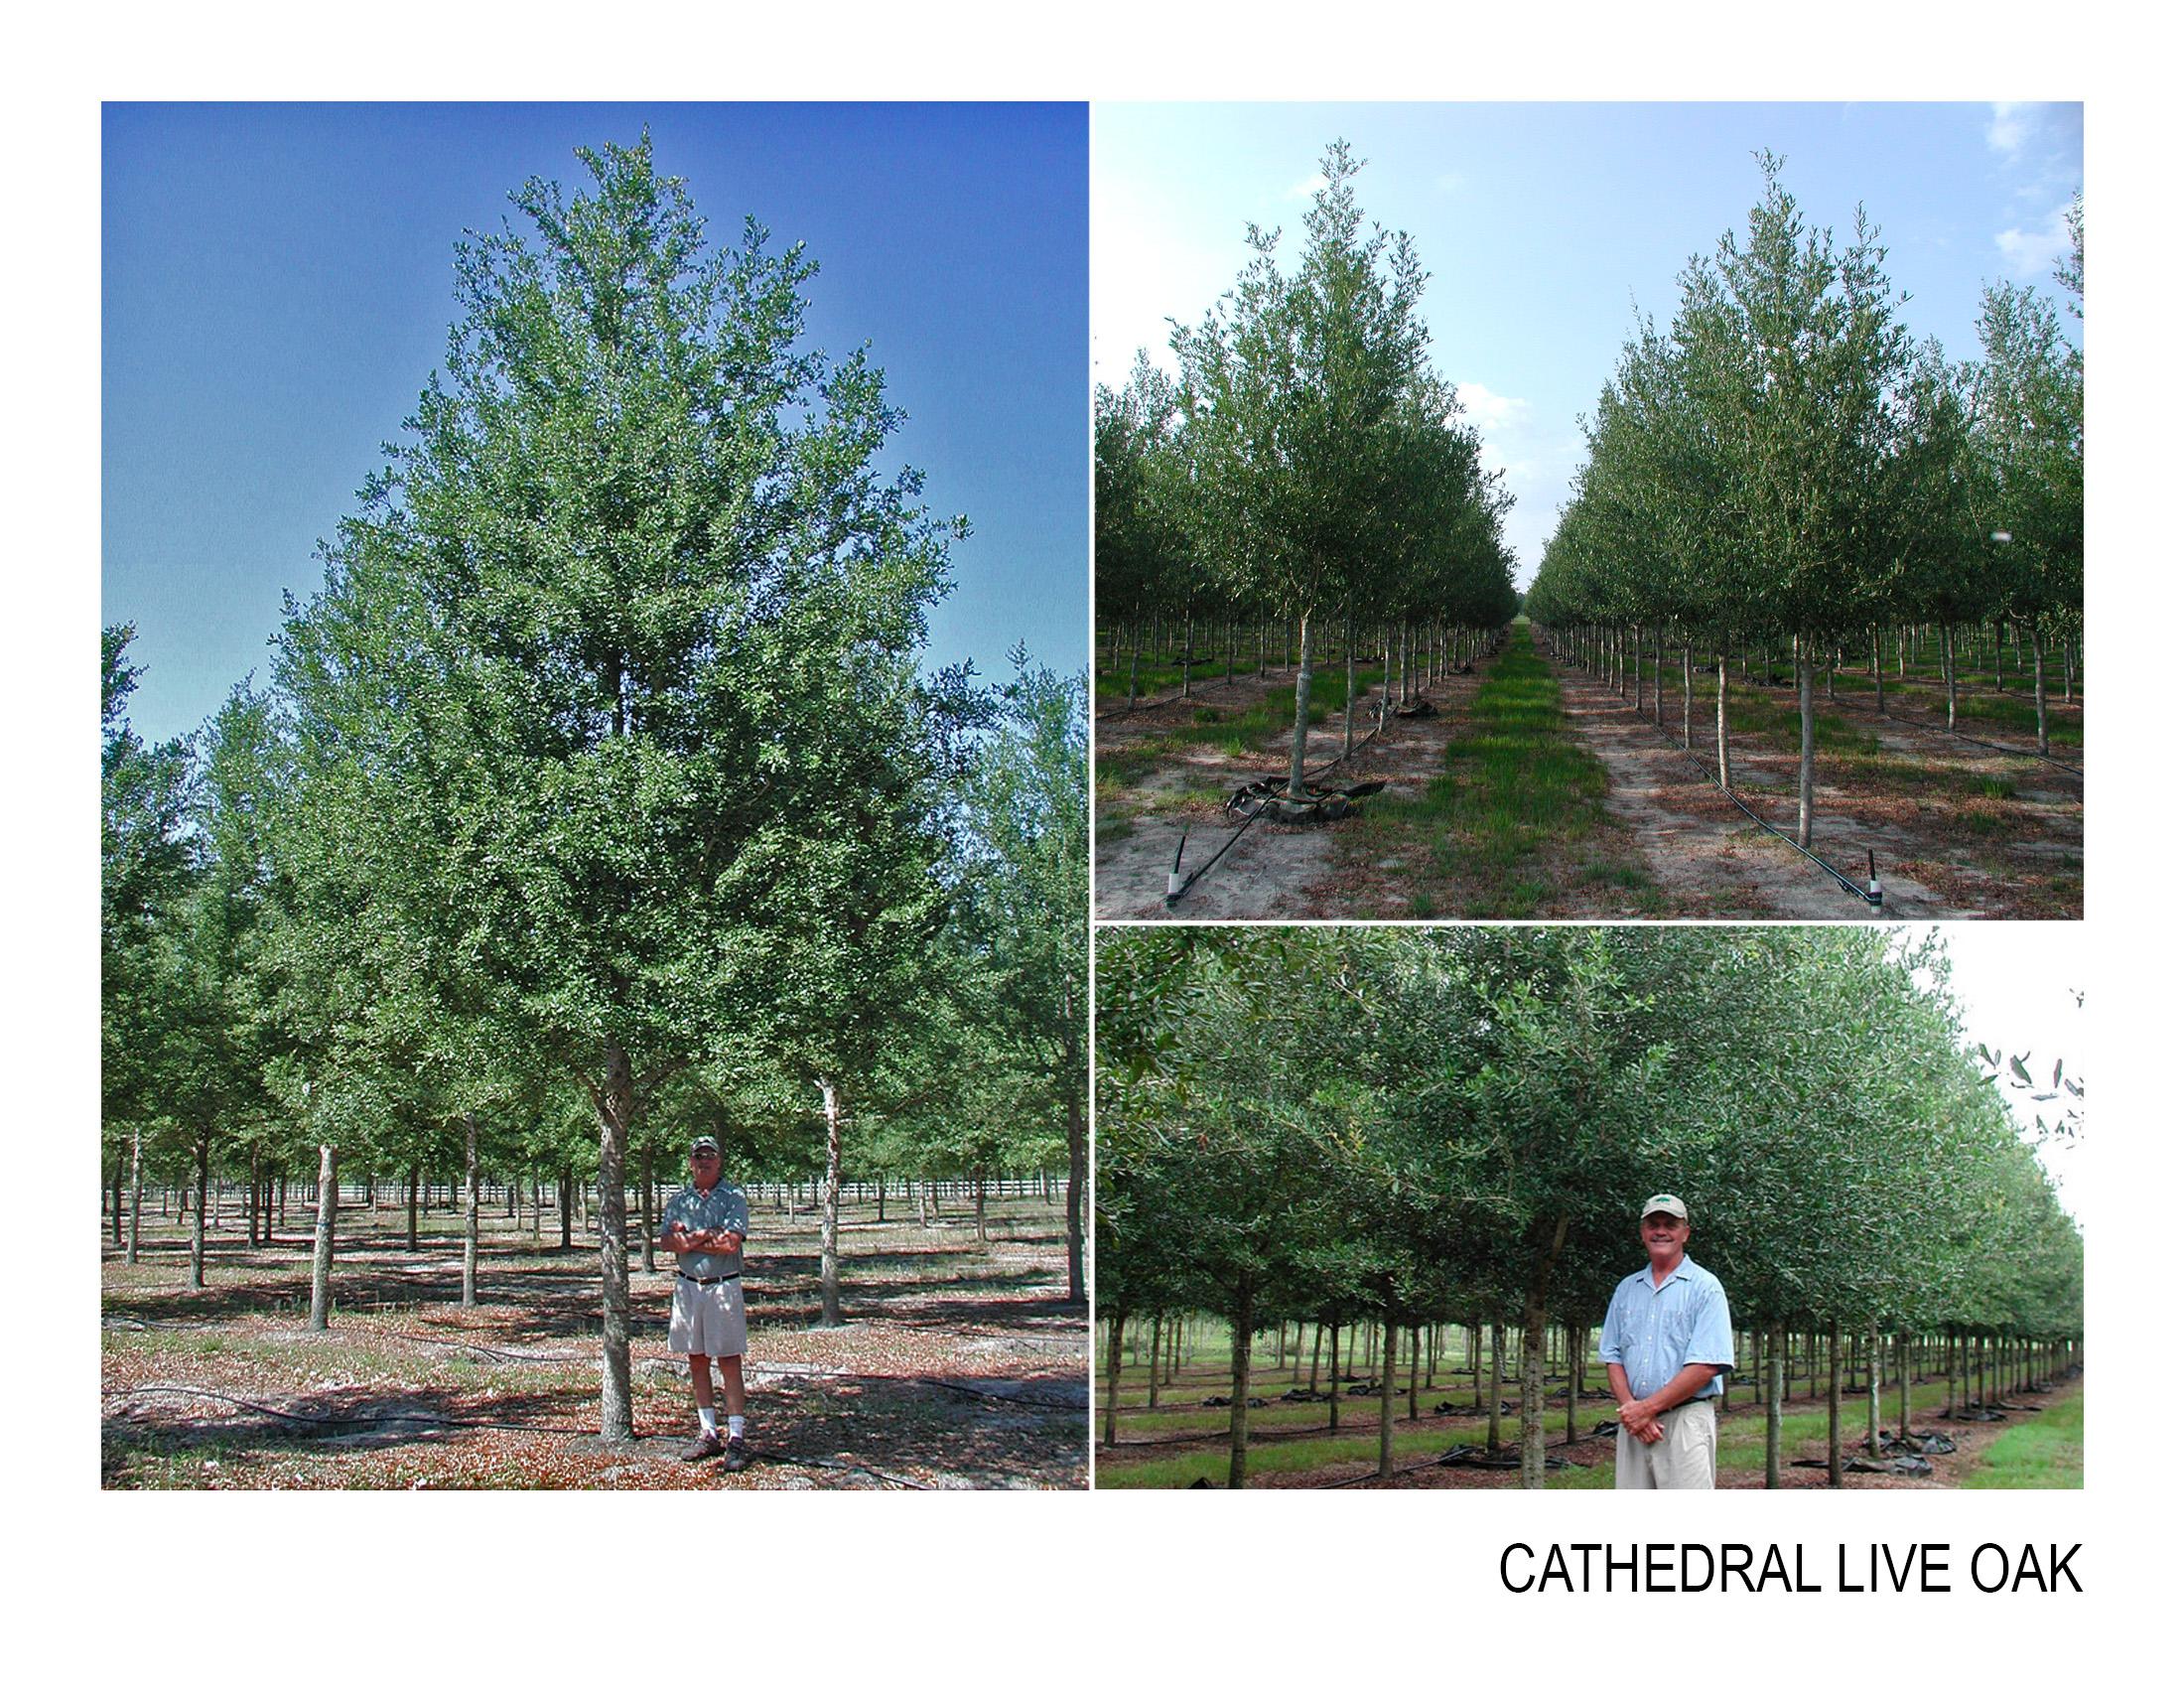 cathedral live oak.jpg